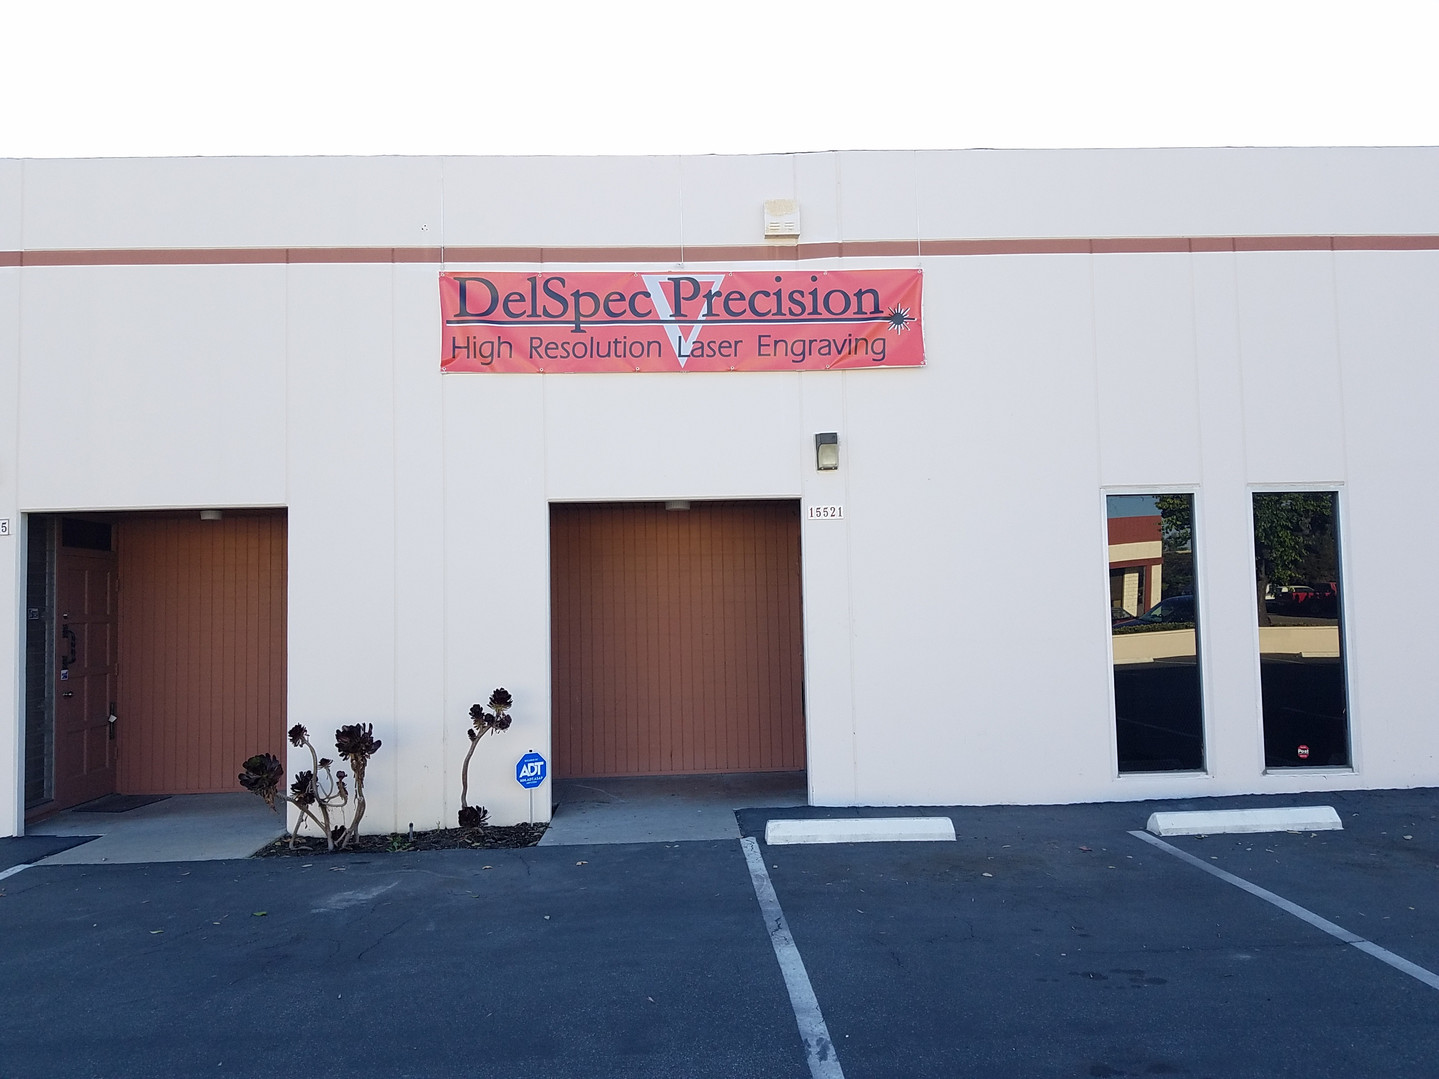 DelSpec Precision Laser Engraving Building